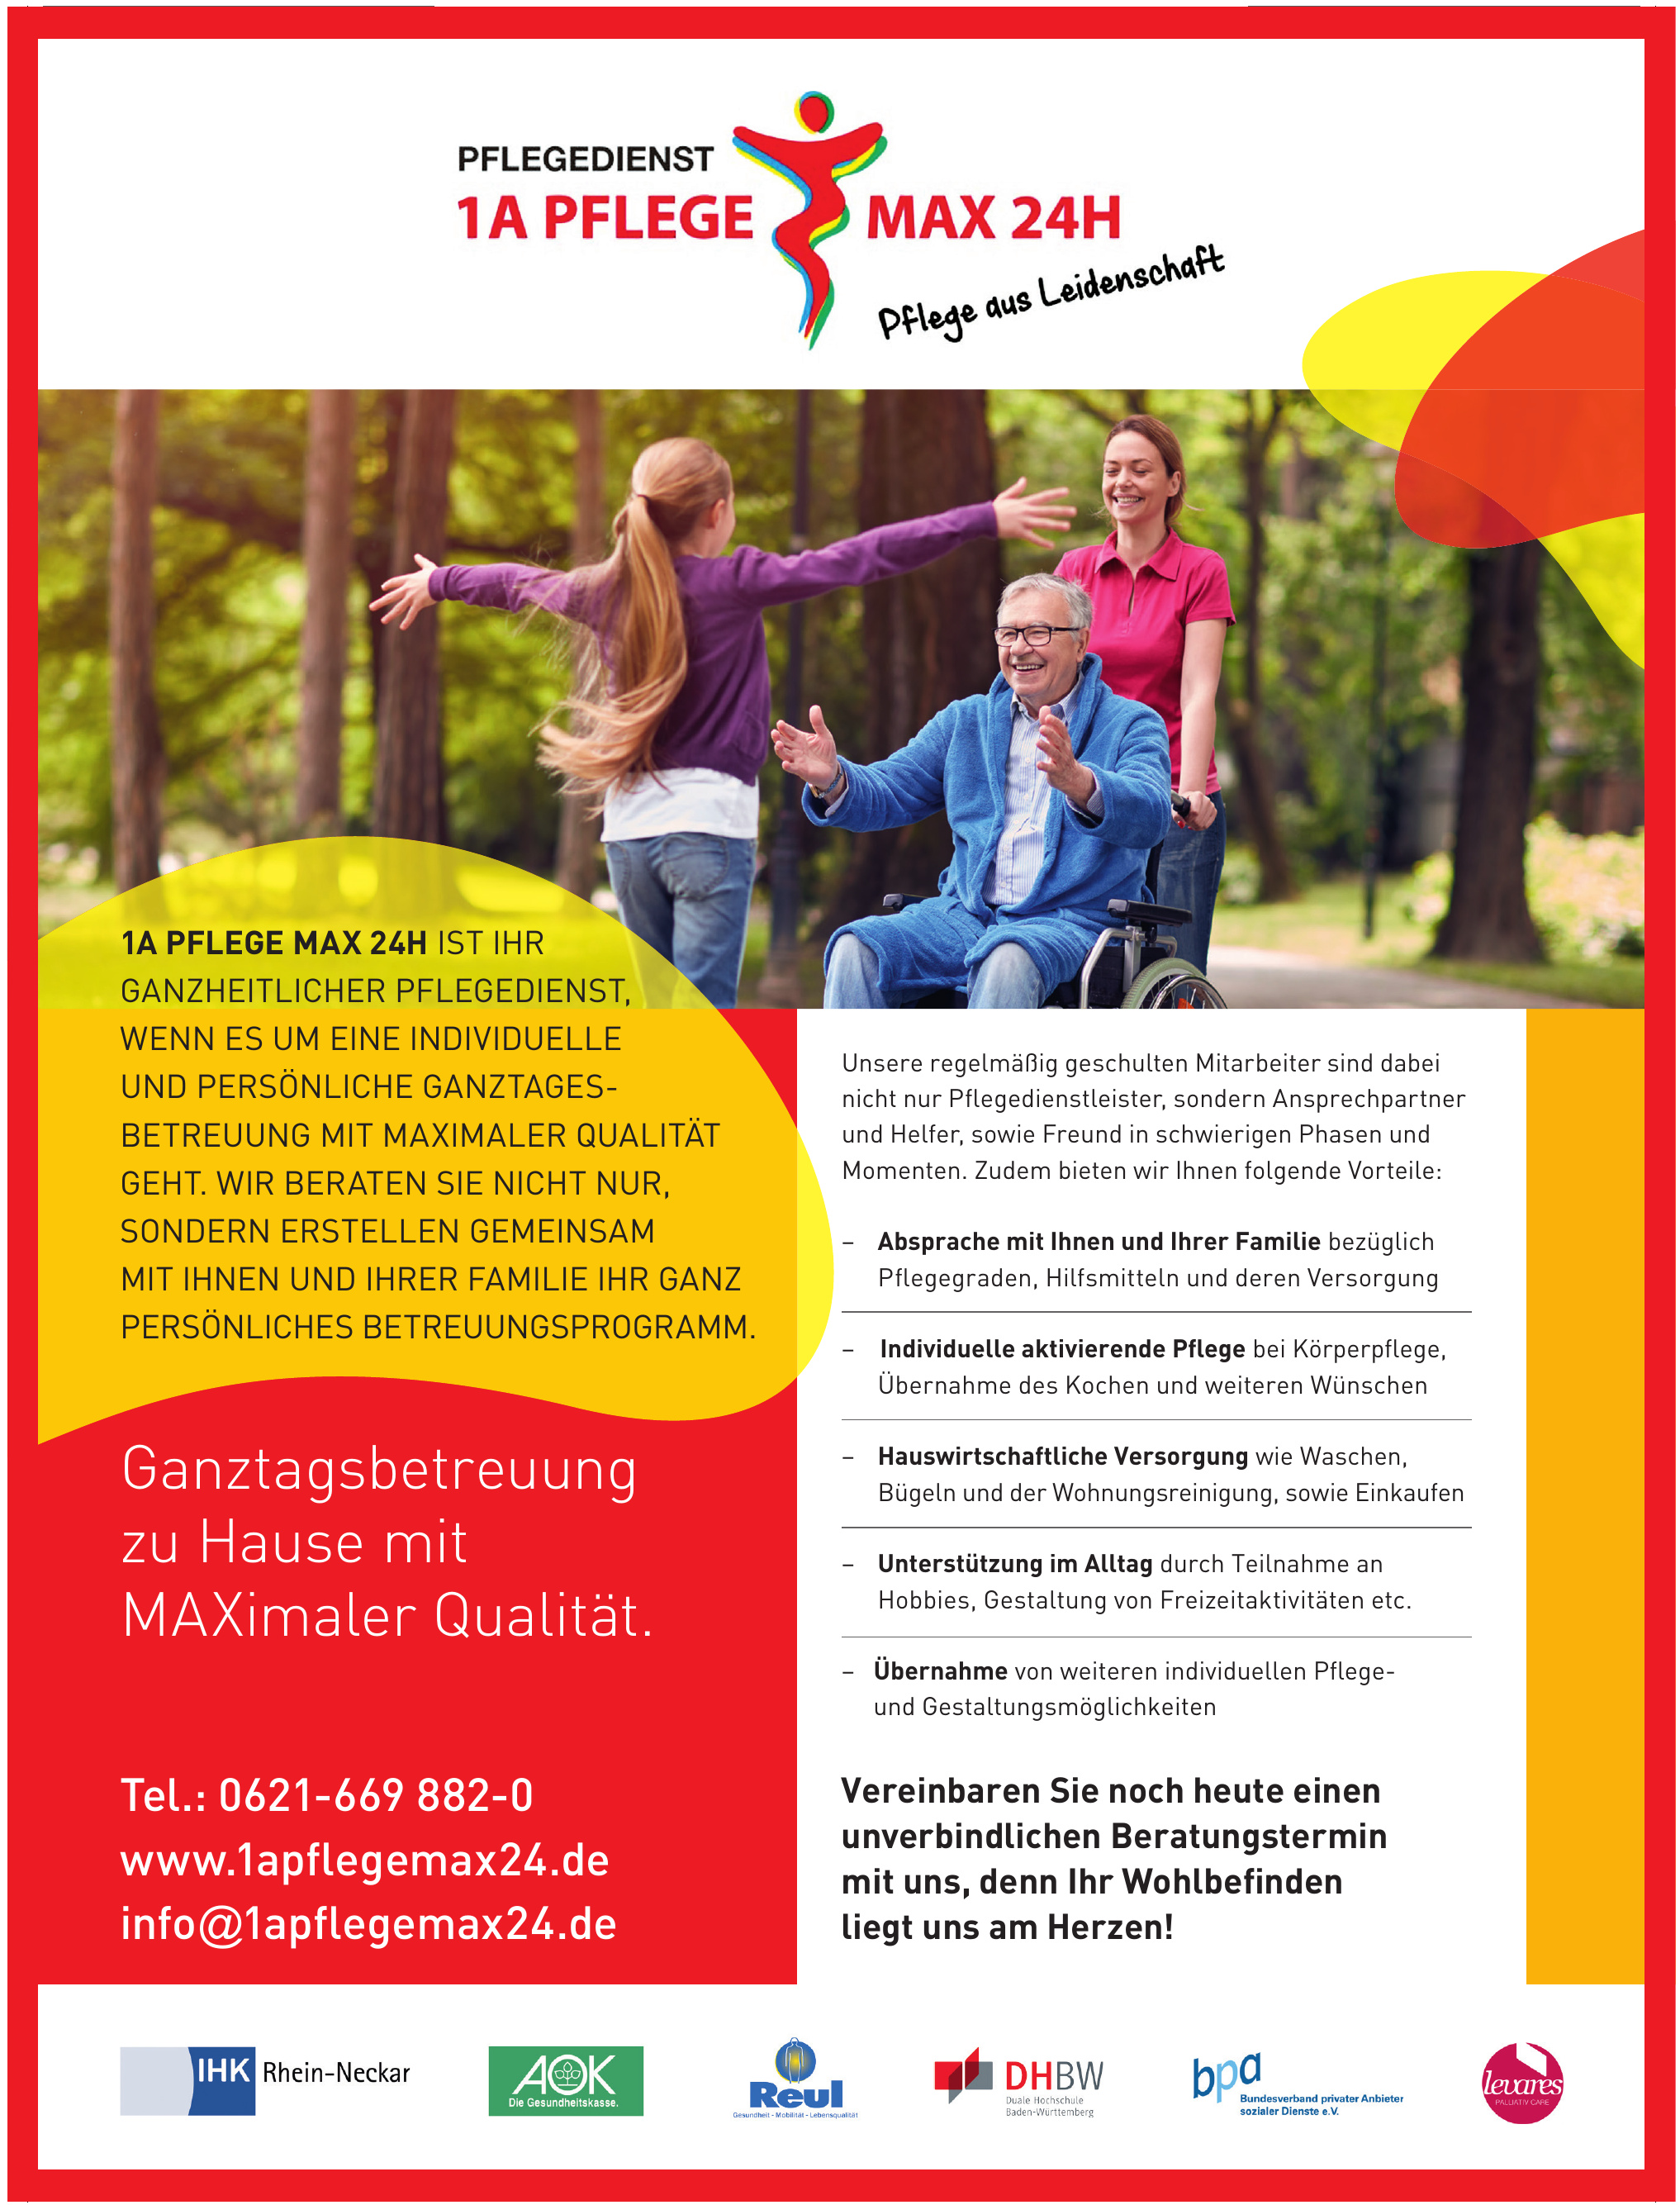 Pflegedienst 1A PflegeMAX 24h GmbH